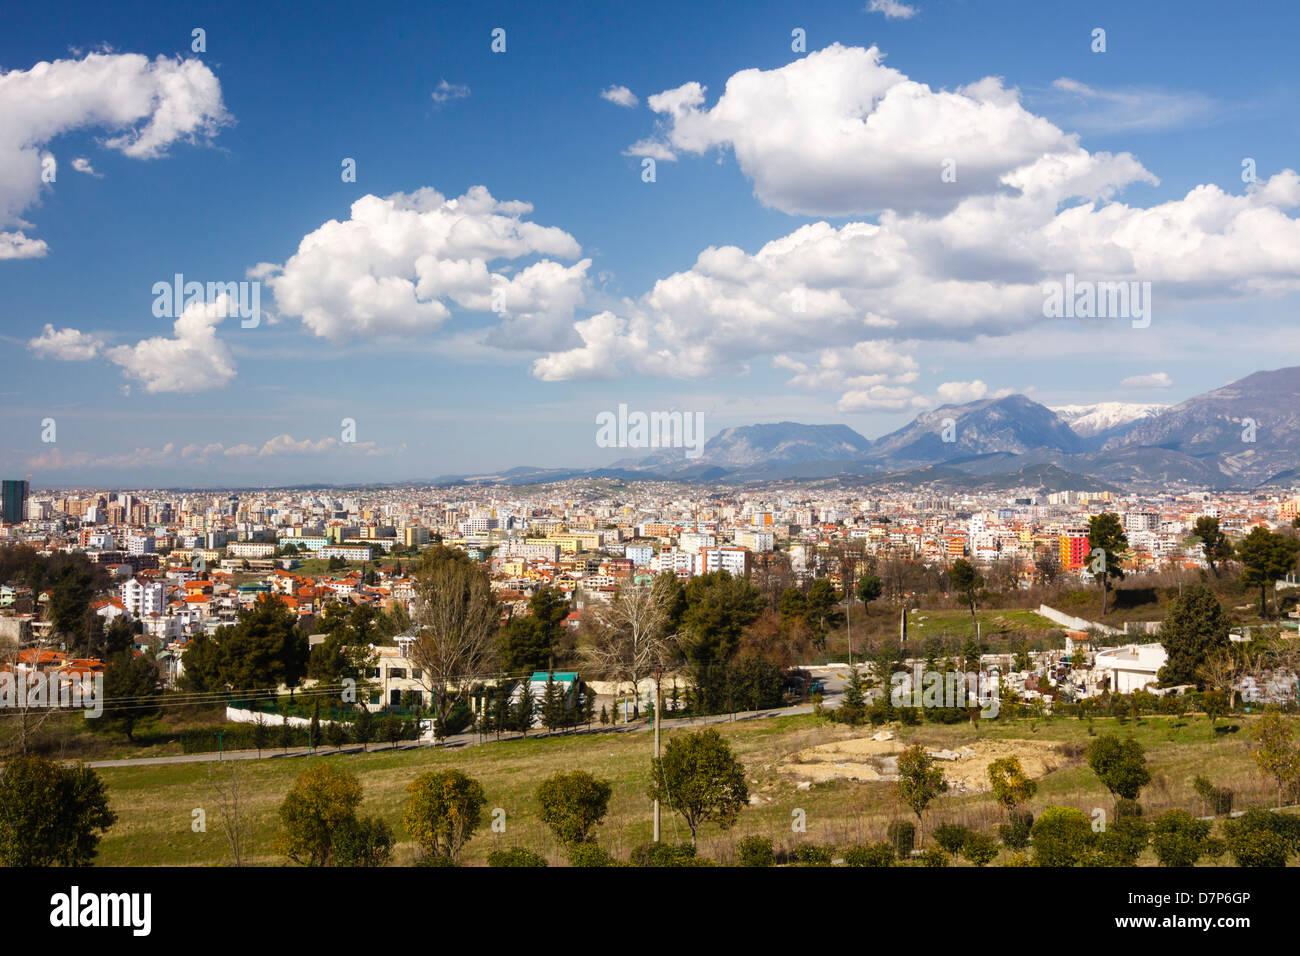 Tirana overview. Albania - Stock Image